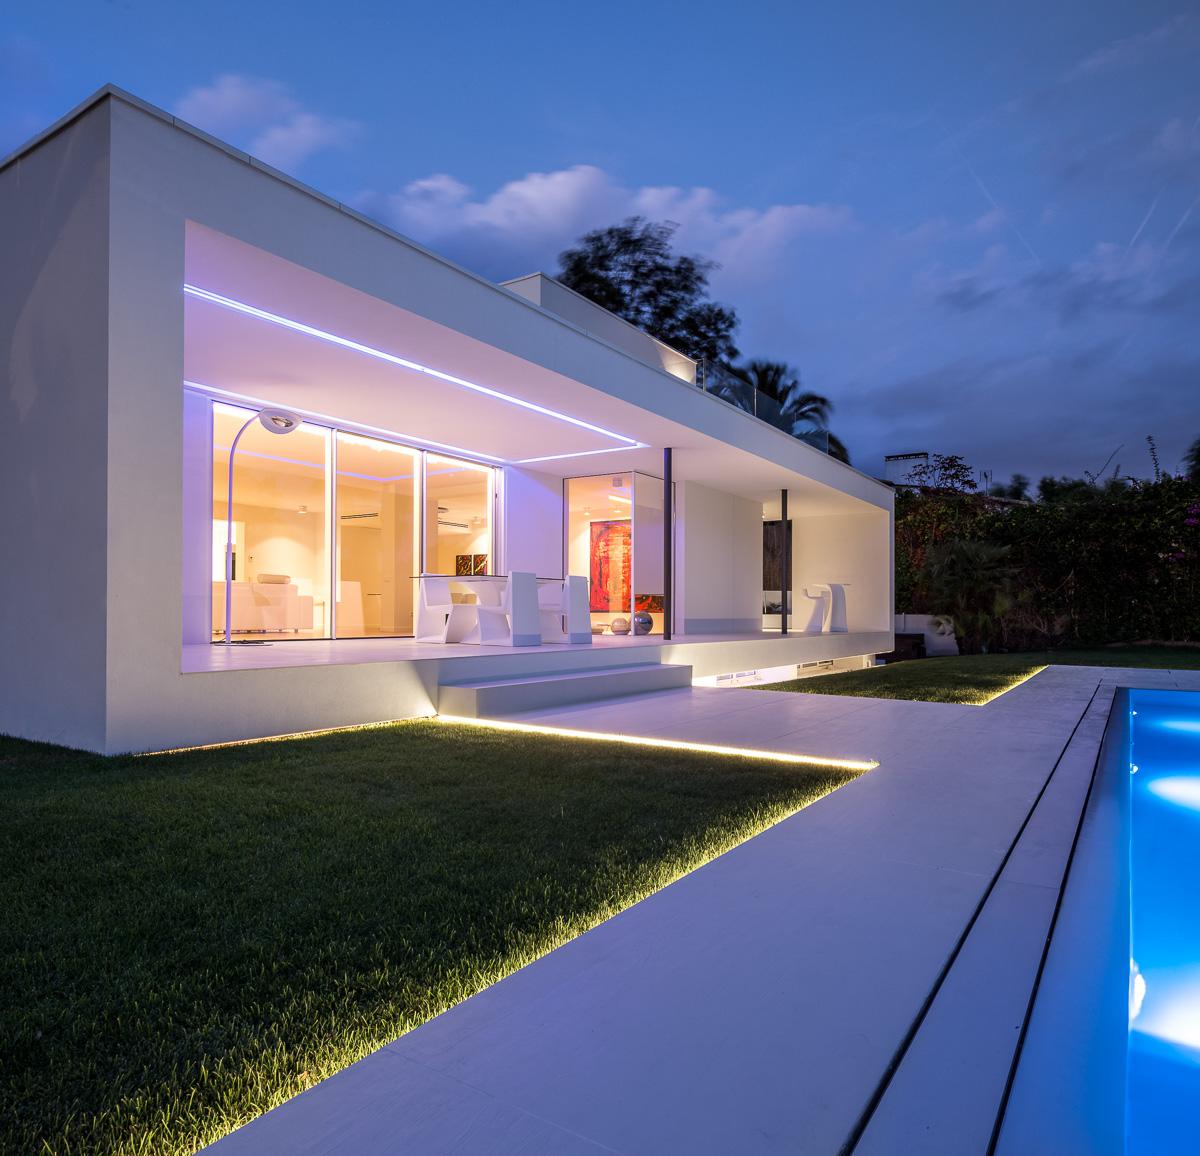 Casa-Herrero-Alella-08023-architects-35-SG1521_0786